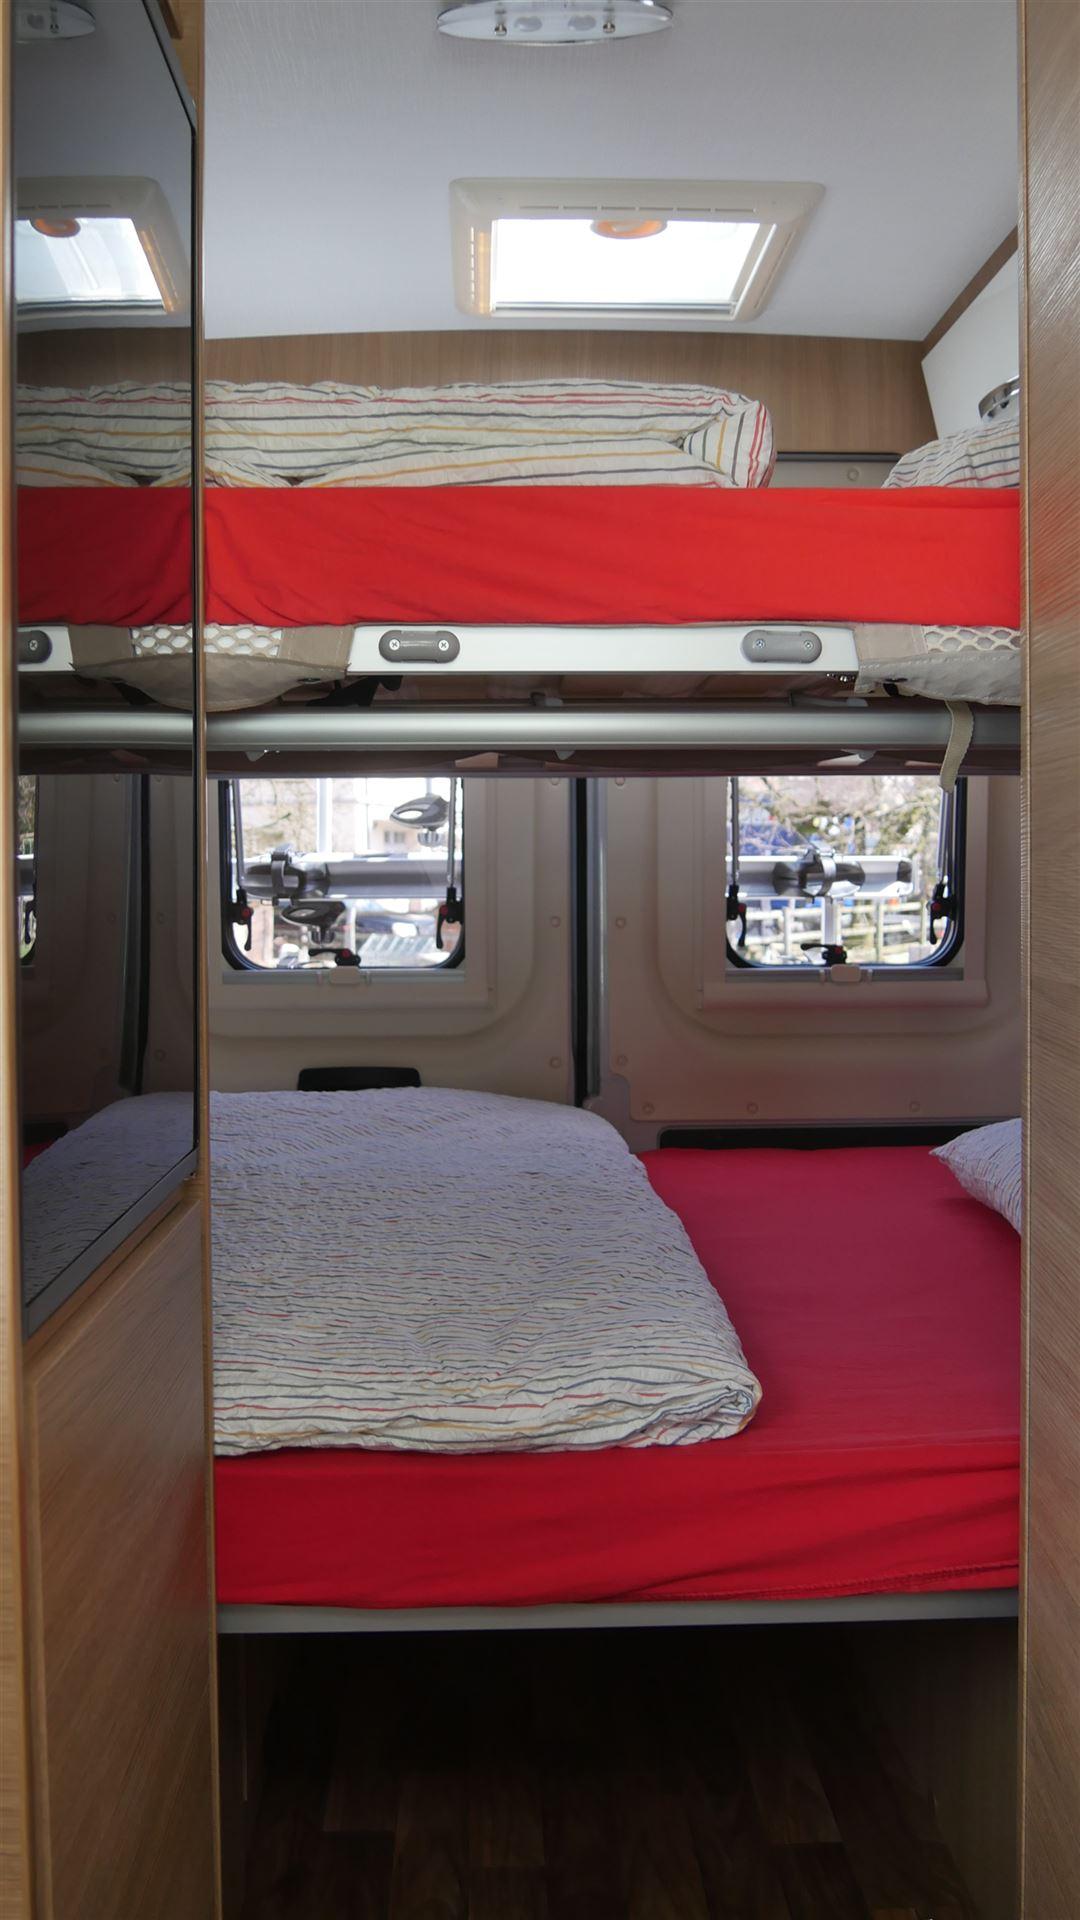 camper mieten wohnmobil mieten und reisemobil mieten. Black Bedroom Furniture Sets. Home Design Ideas